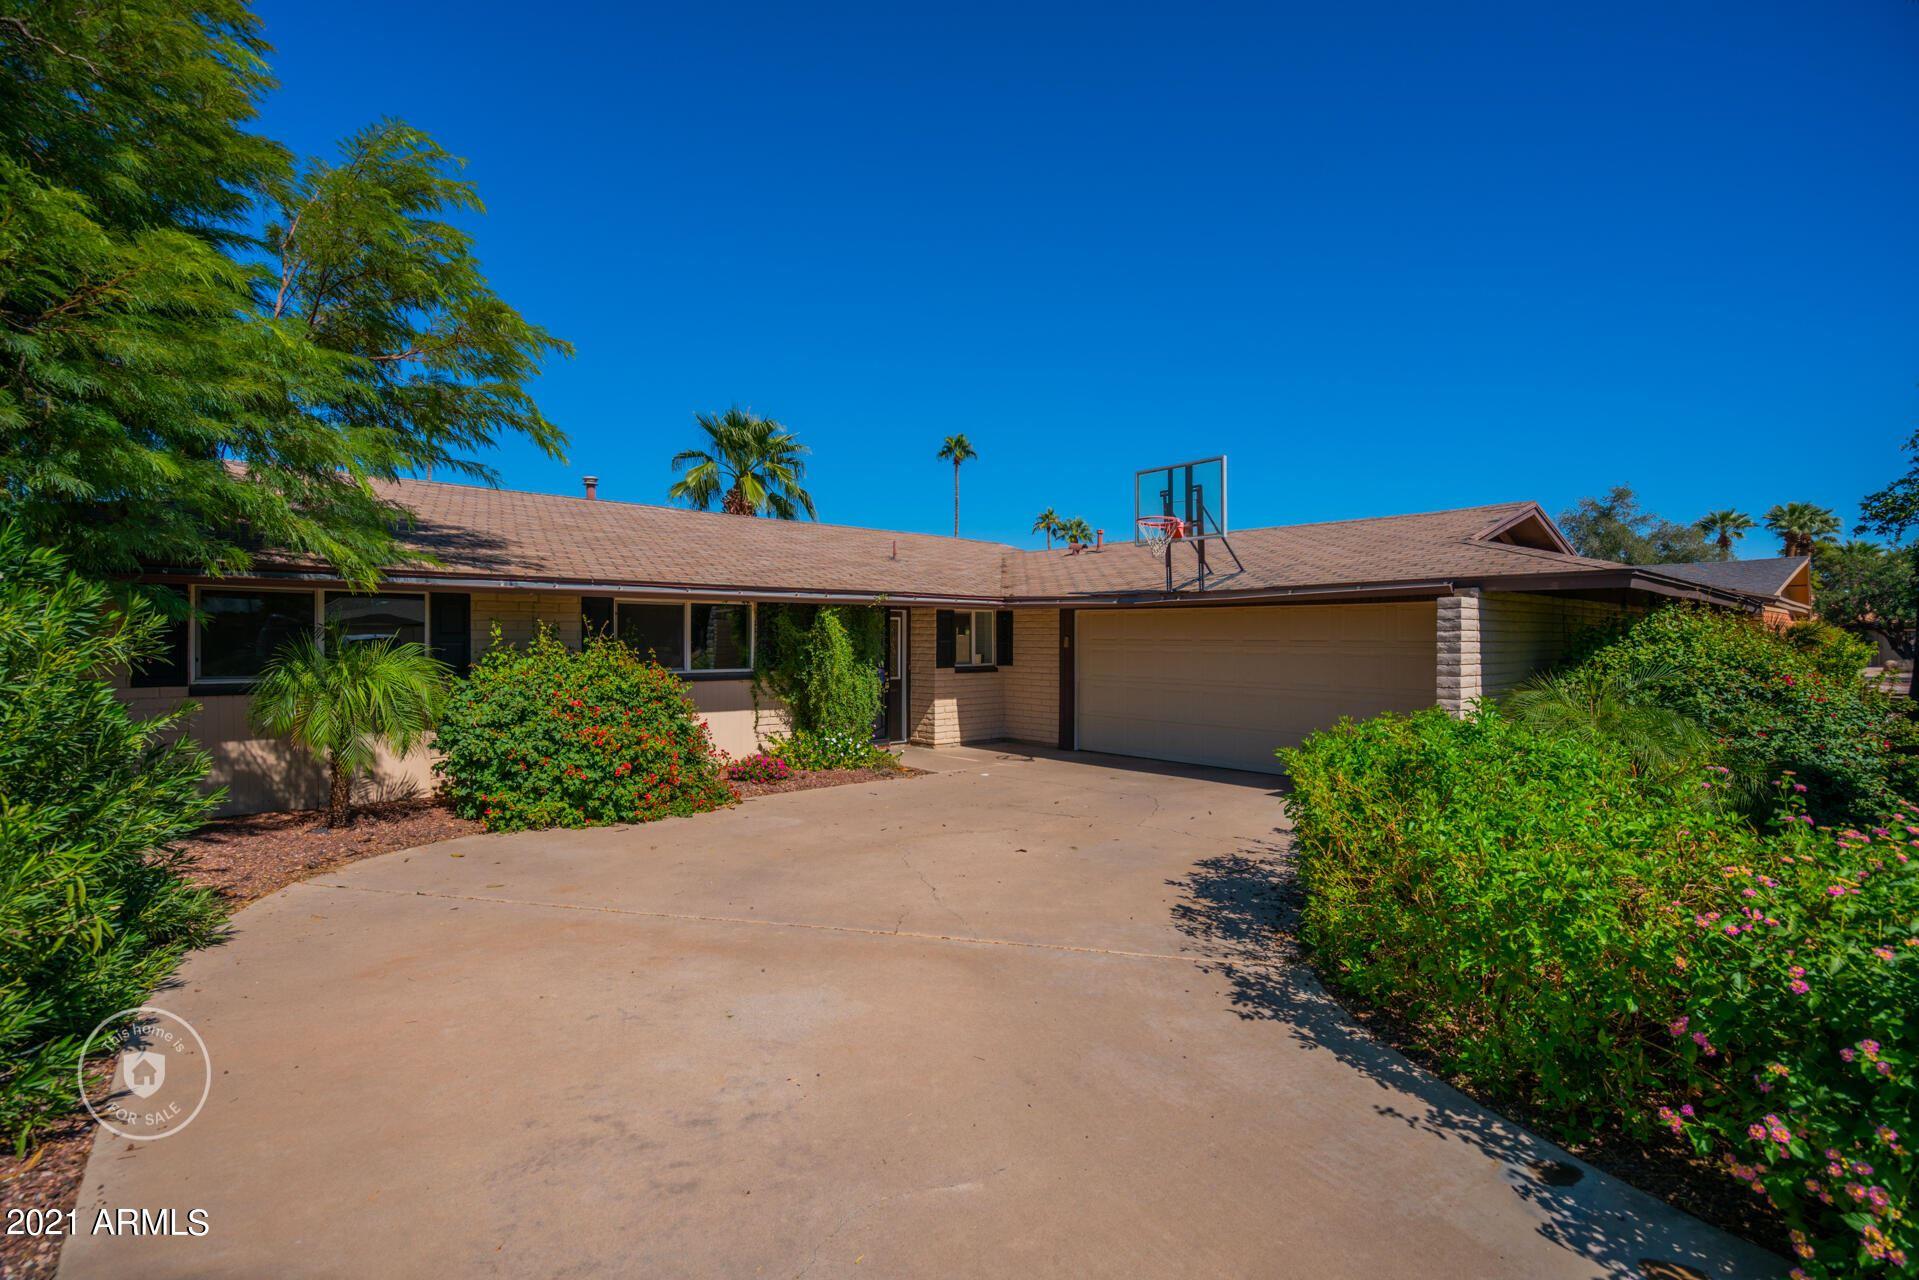 Photo of 506 E SAGEBRUSH Street, Litchfield Park, AZ 85340 (MLS # 6309049)